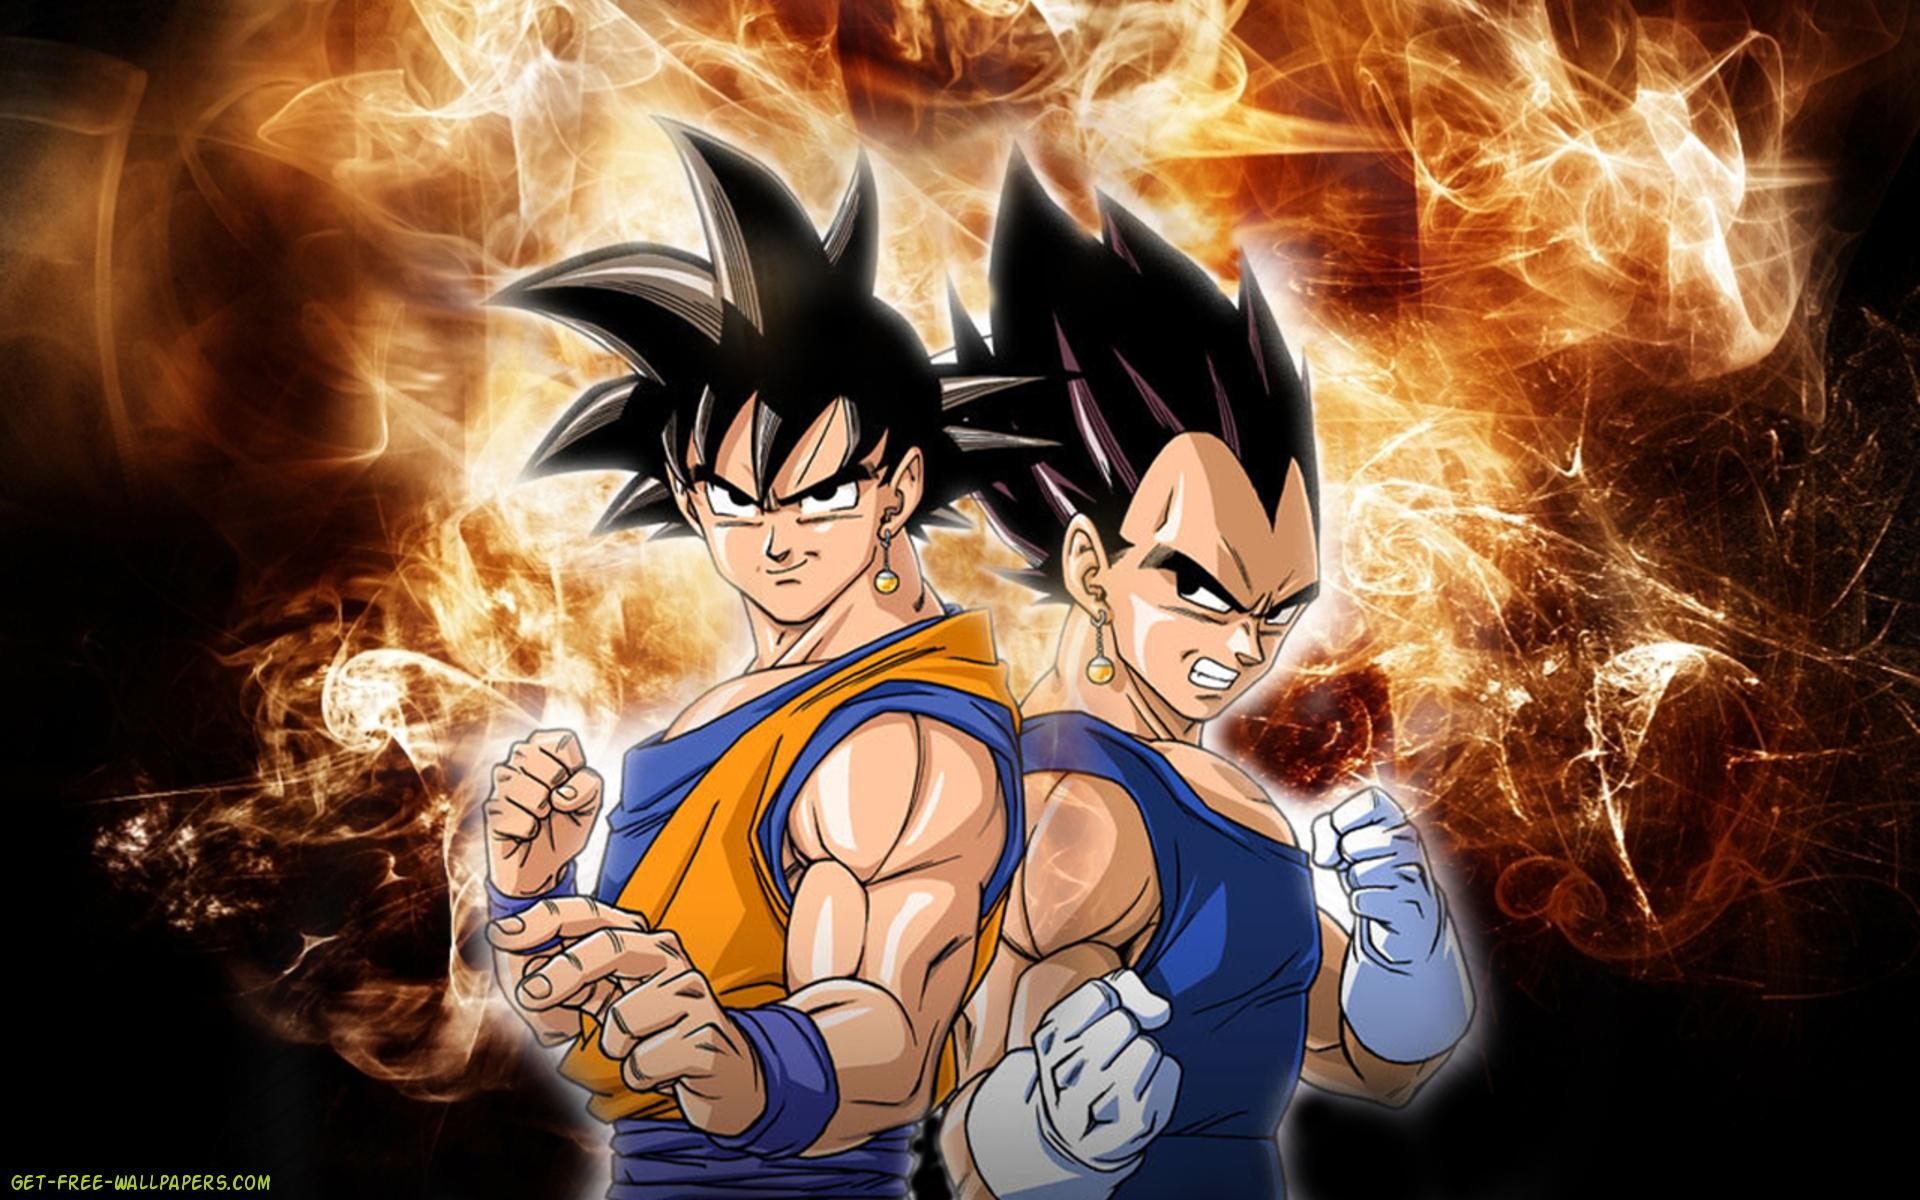 Goku And Vegeta wallpaper   1152185 1920x1200